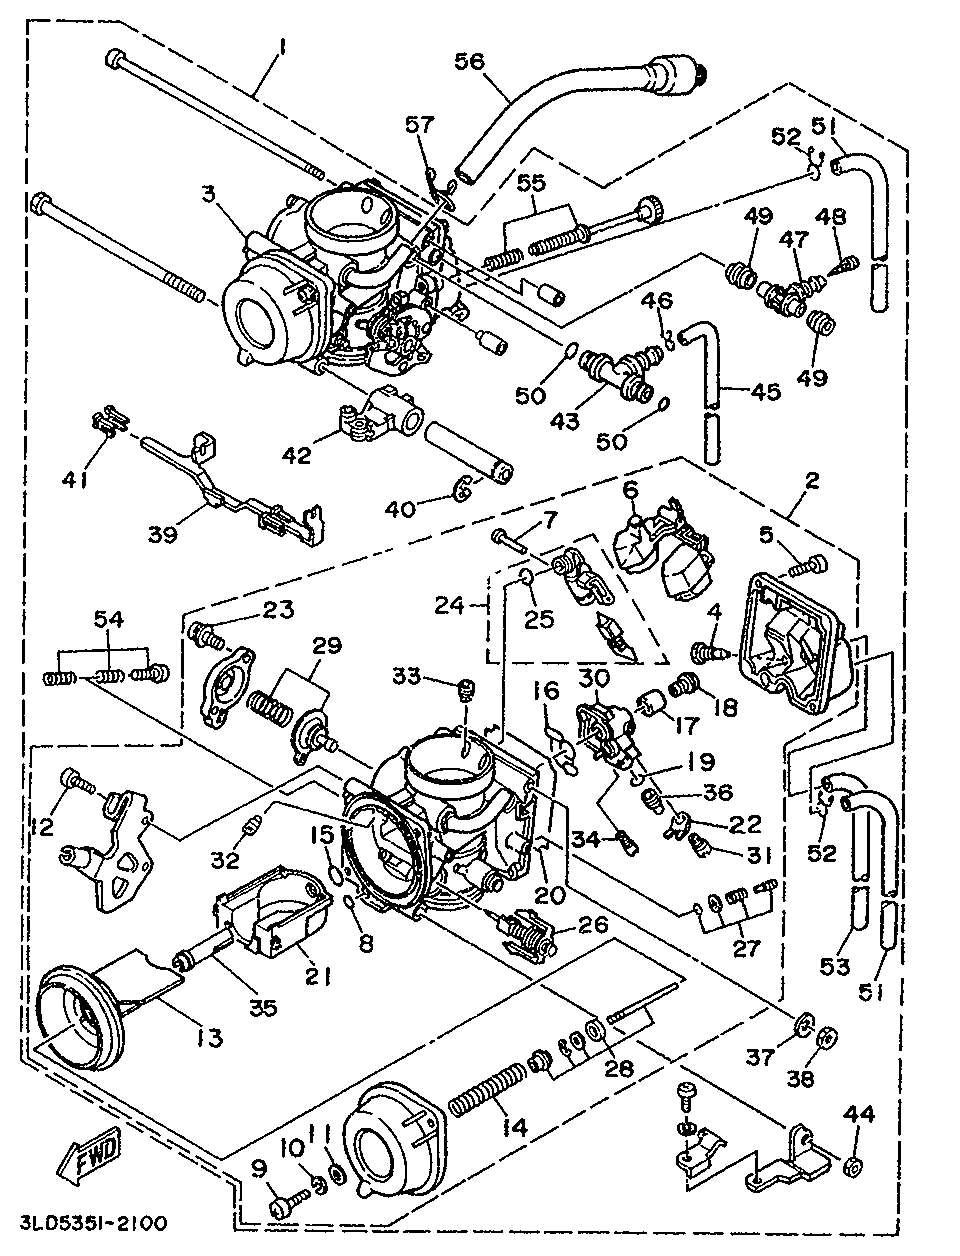 xtz 750 1995